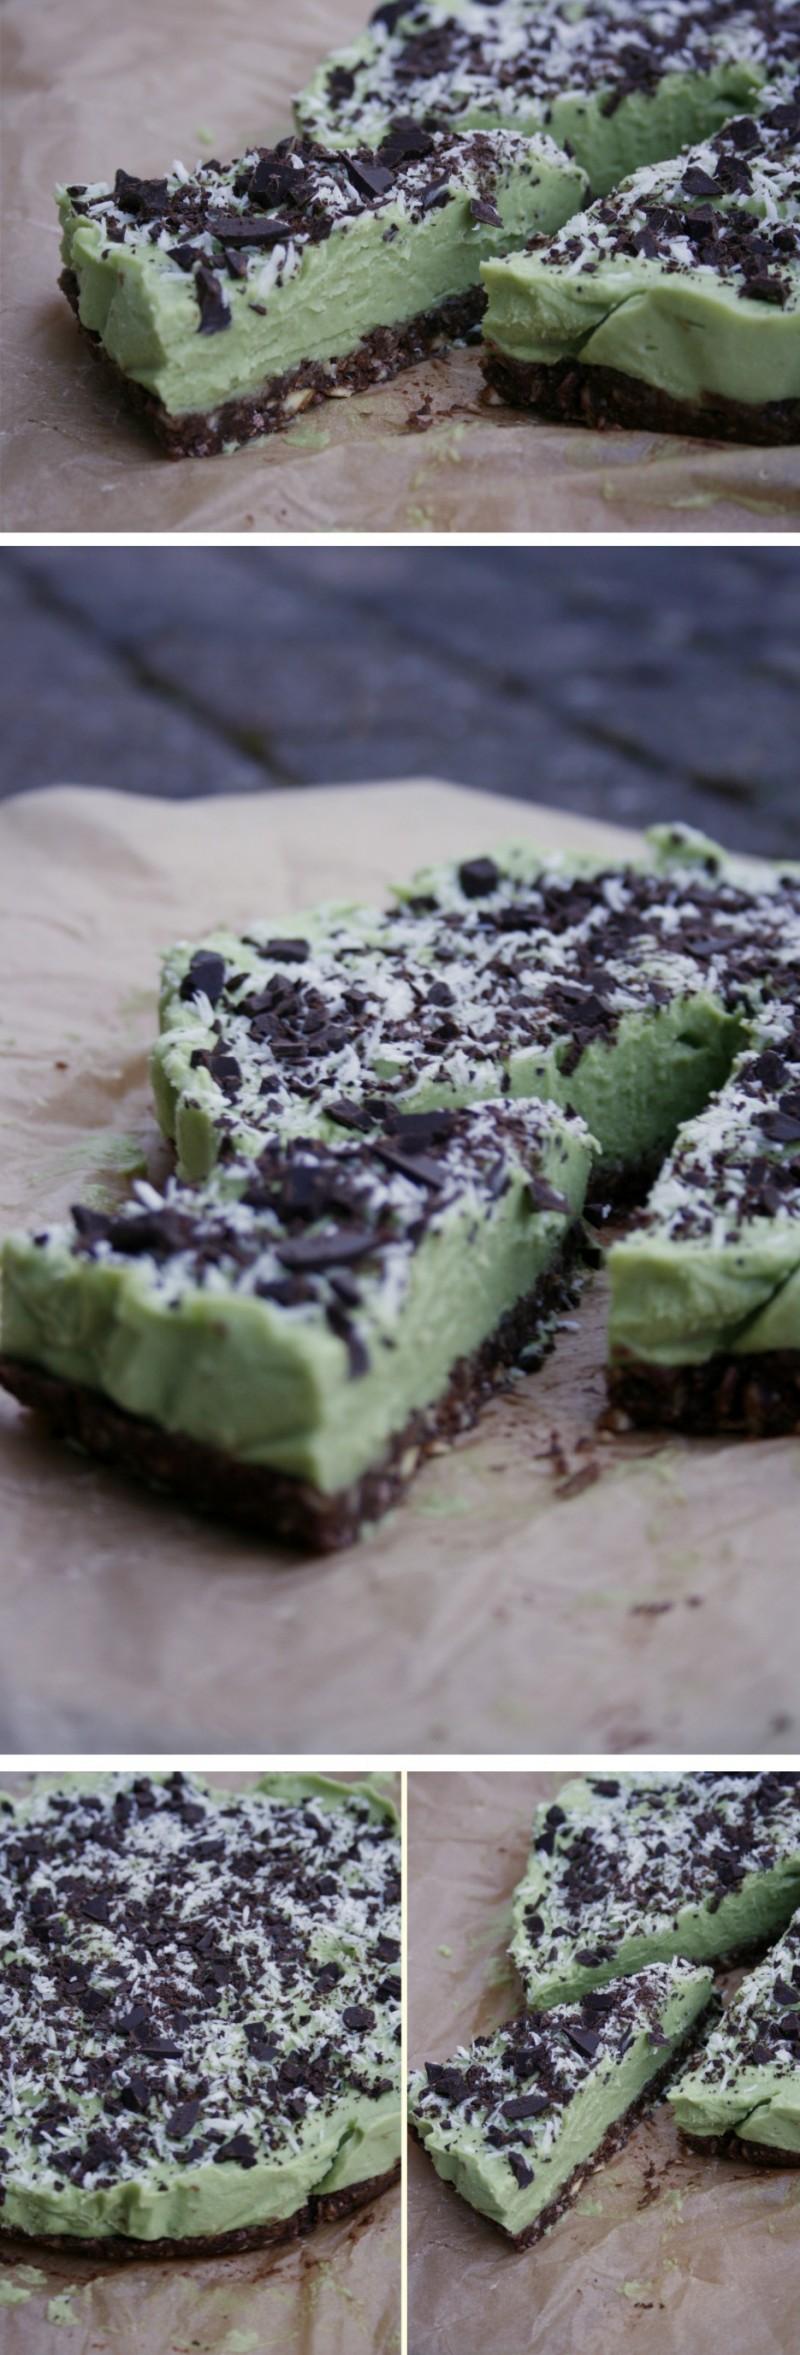 Raw chocolate avocado cheesecake - christinebonde.dk